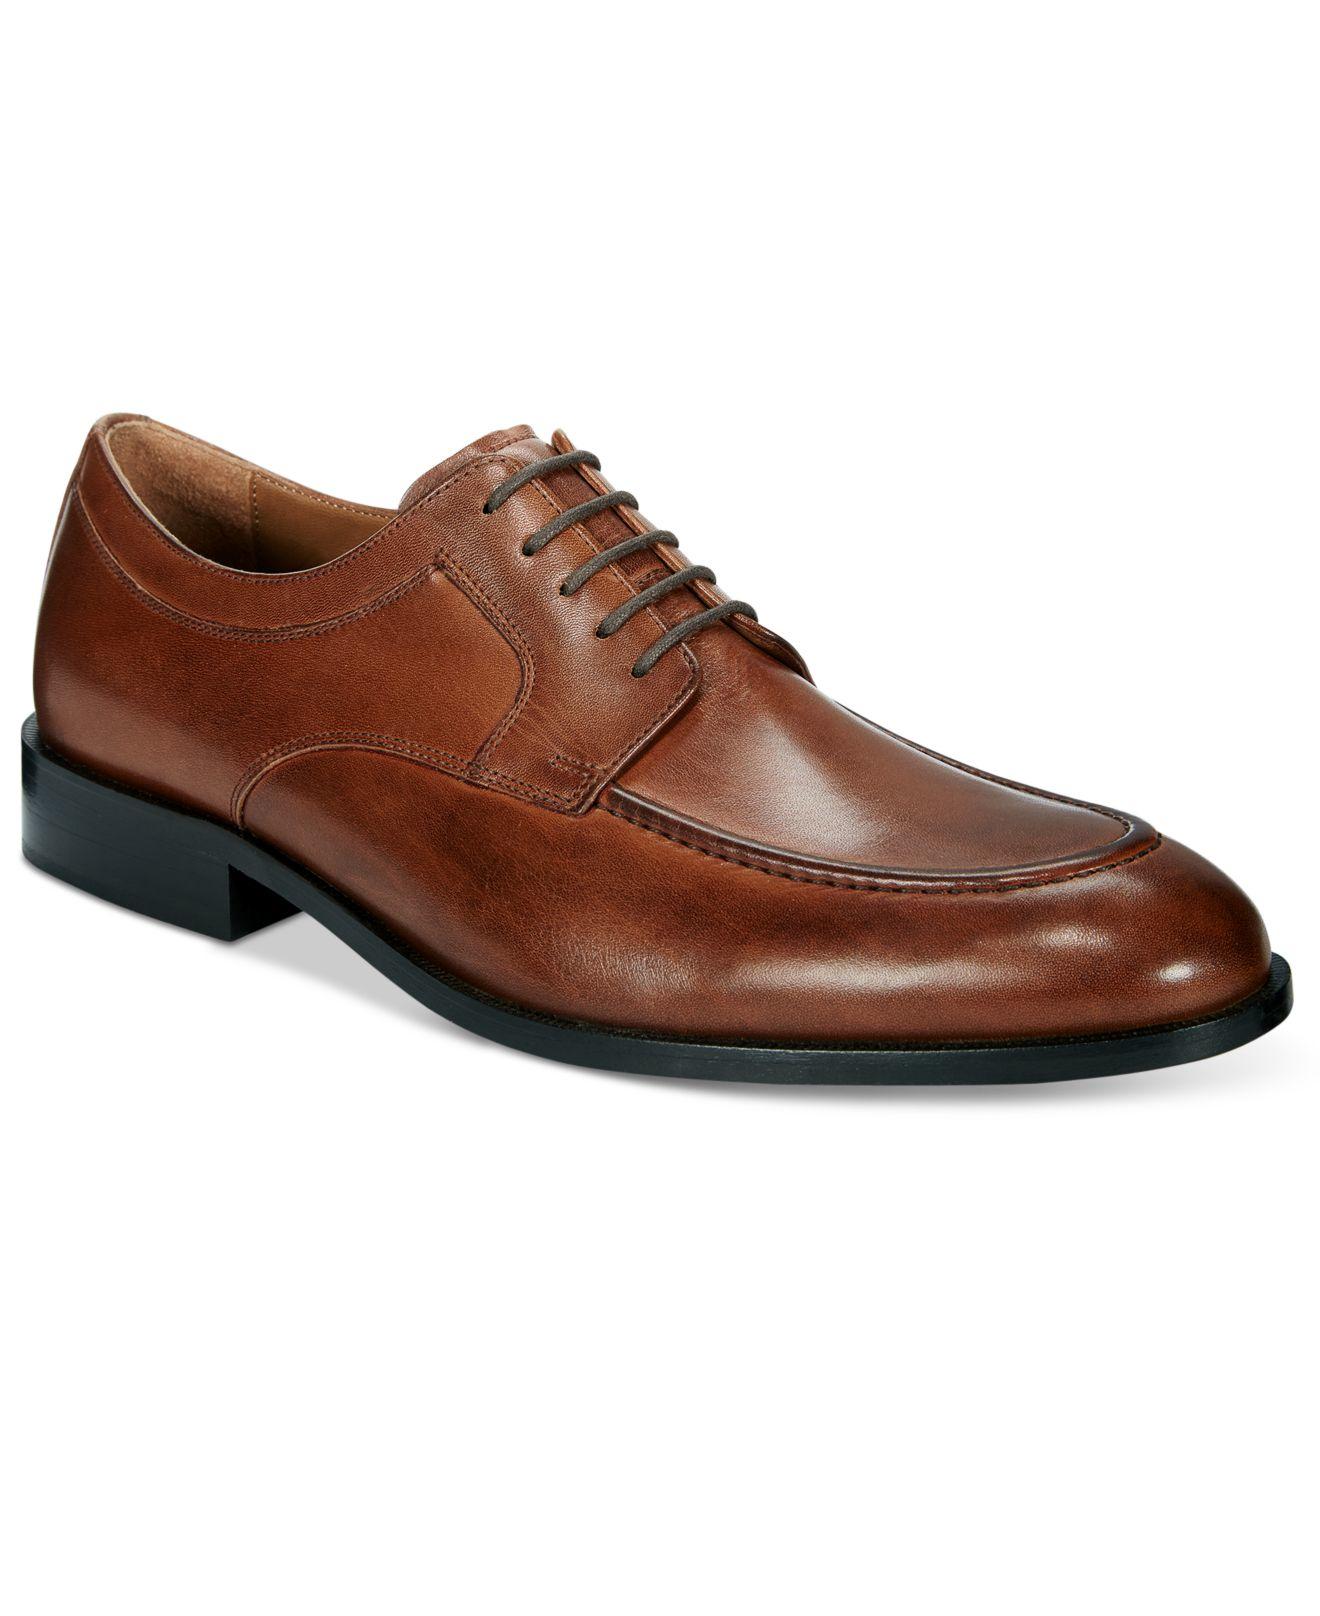 Johnston And Murphy Mens Shoes Macys